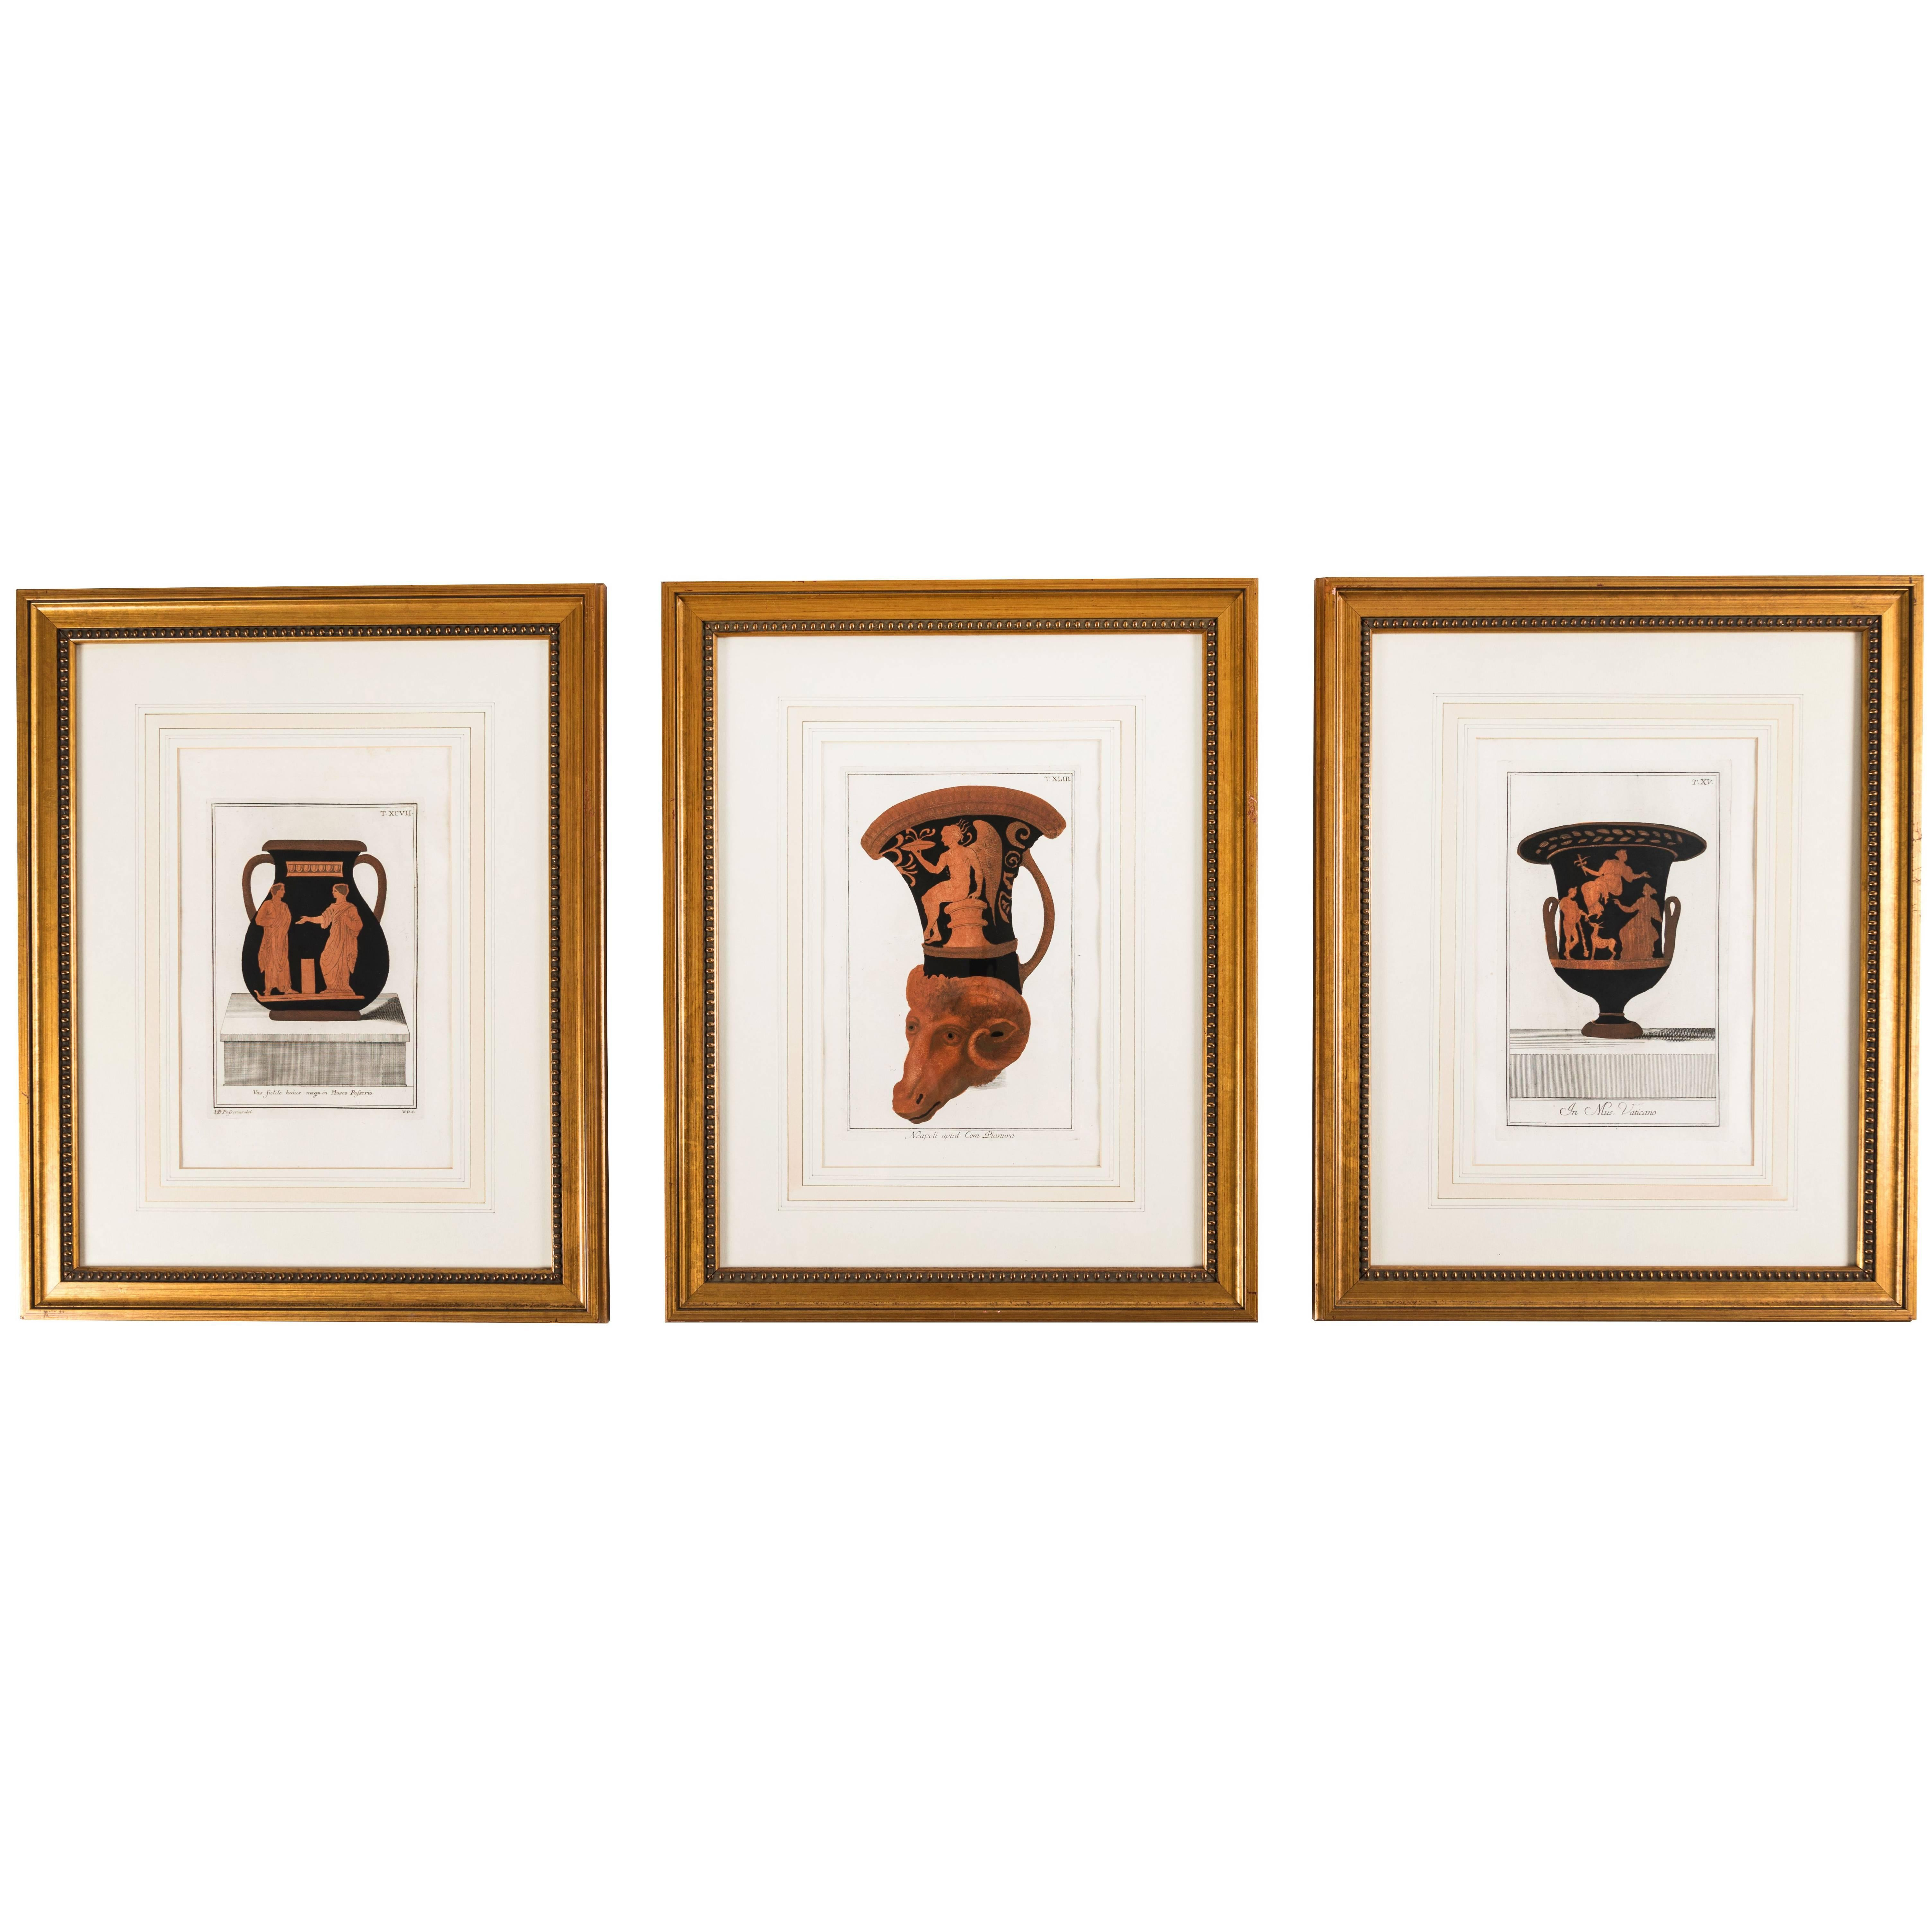 Set of Three Framed Prints Depicting Greek Apulian Red-Figure Pottery